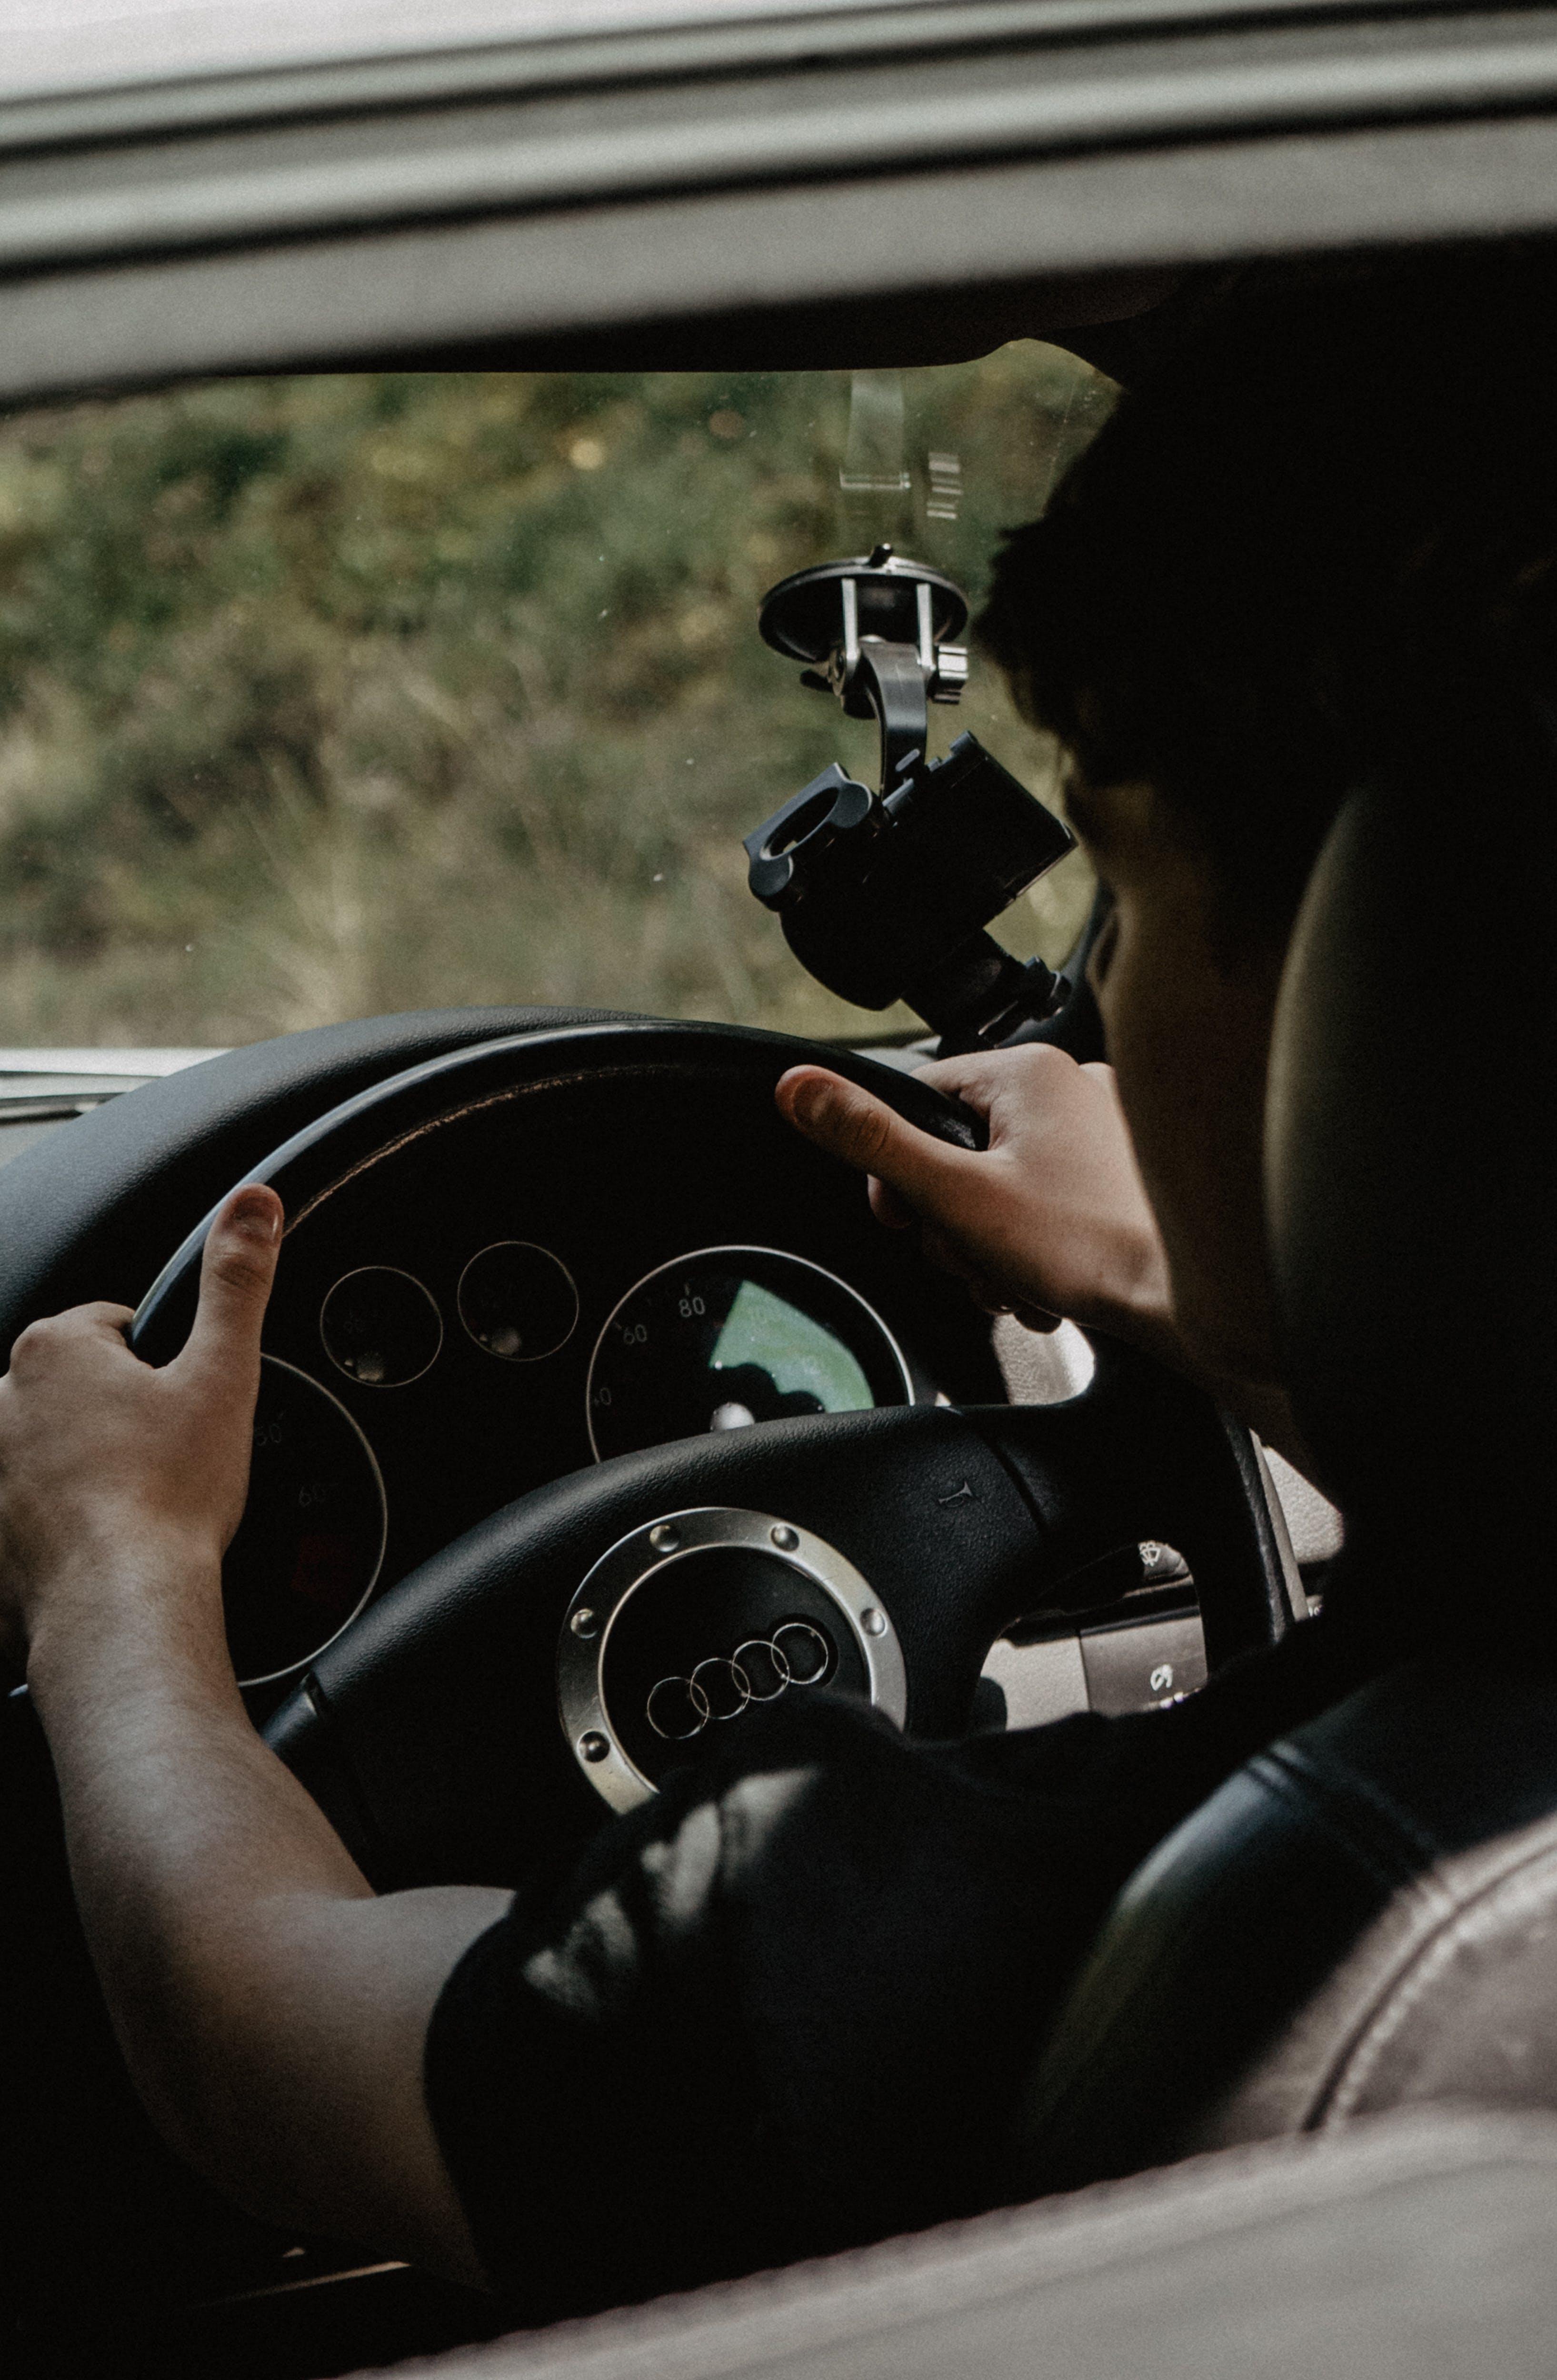 Kostenloses Stock Foto zu armaturenbrett, audi, auto, autoinnenraum